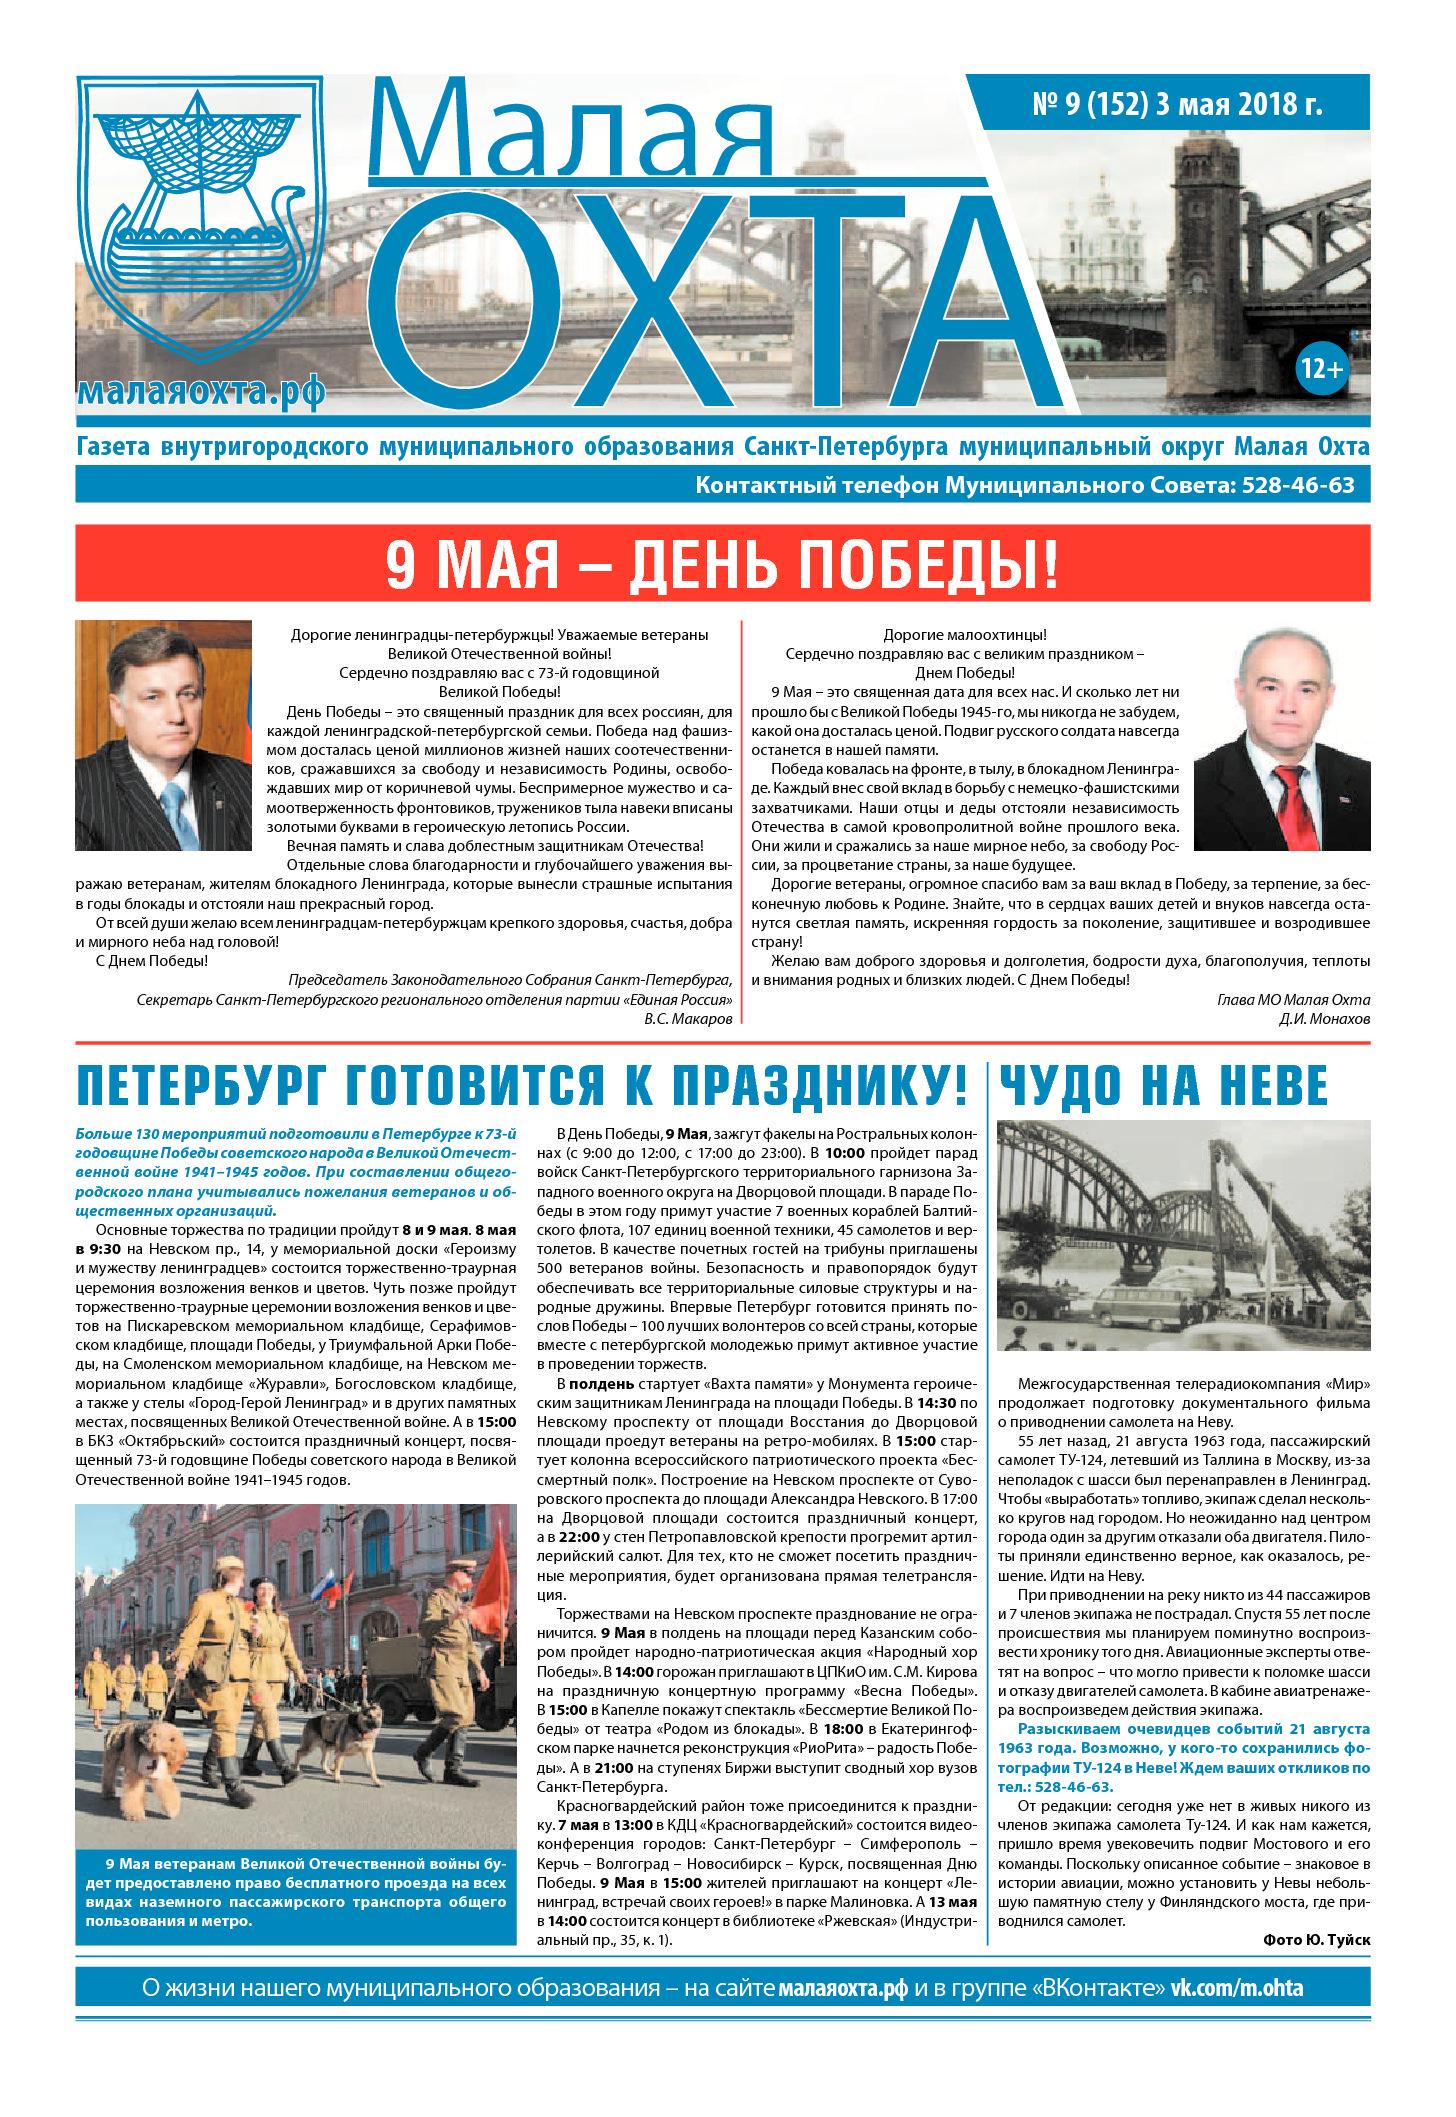 Газета №9 2018